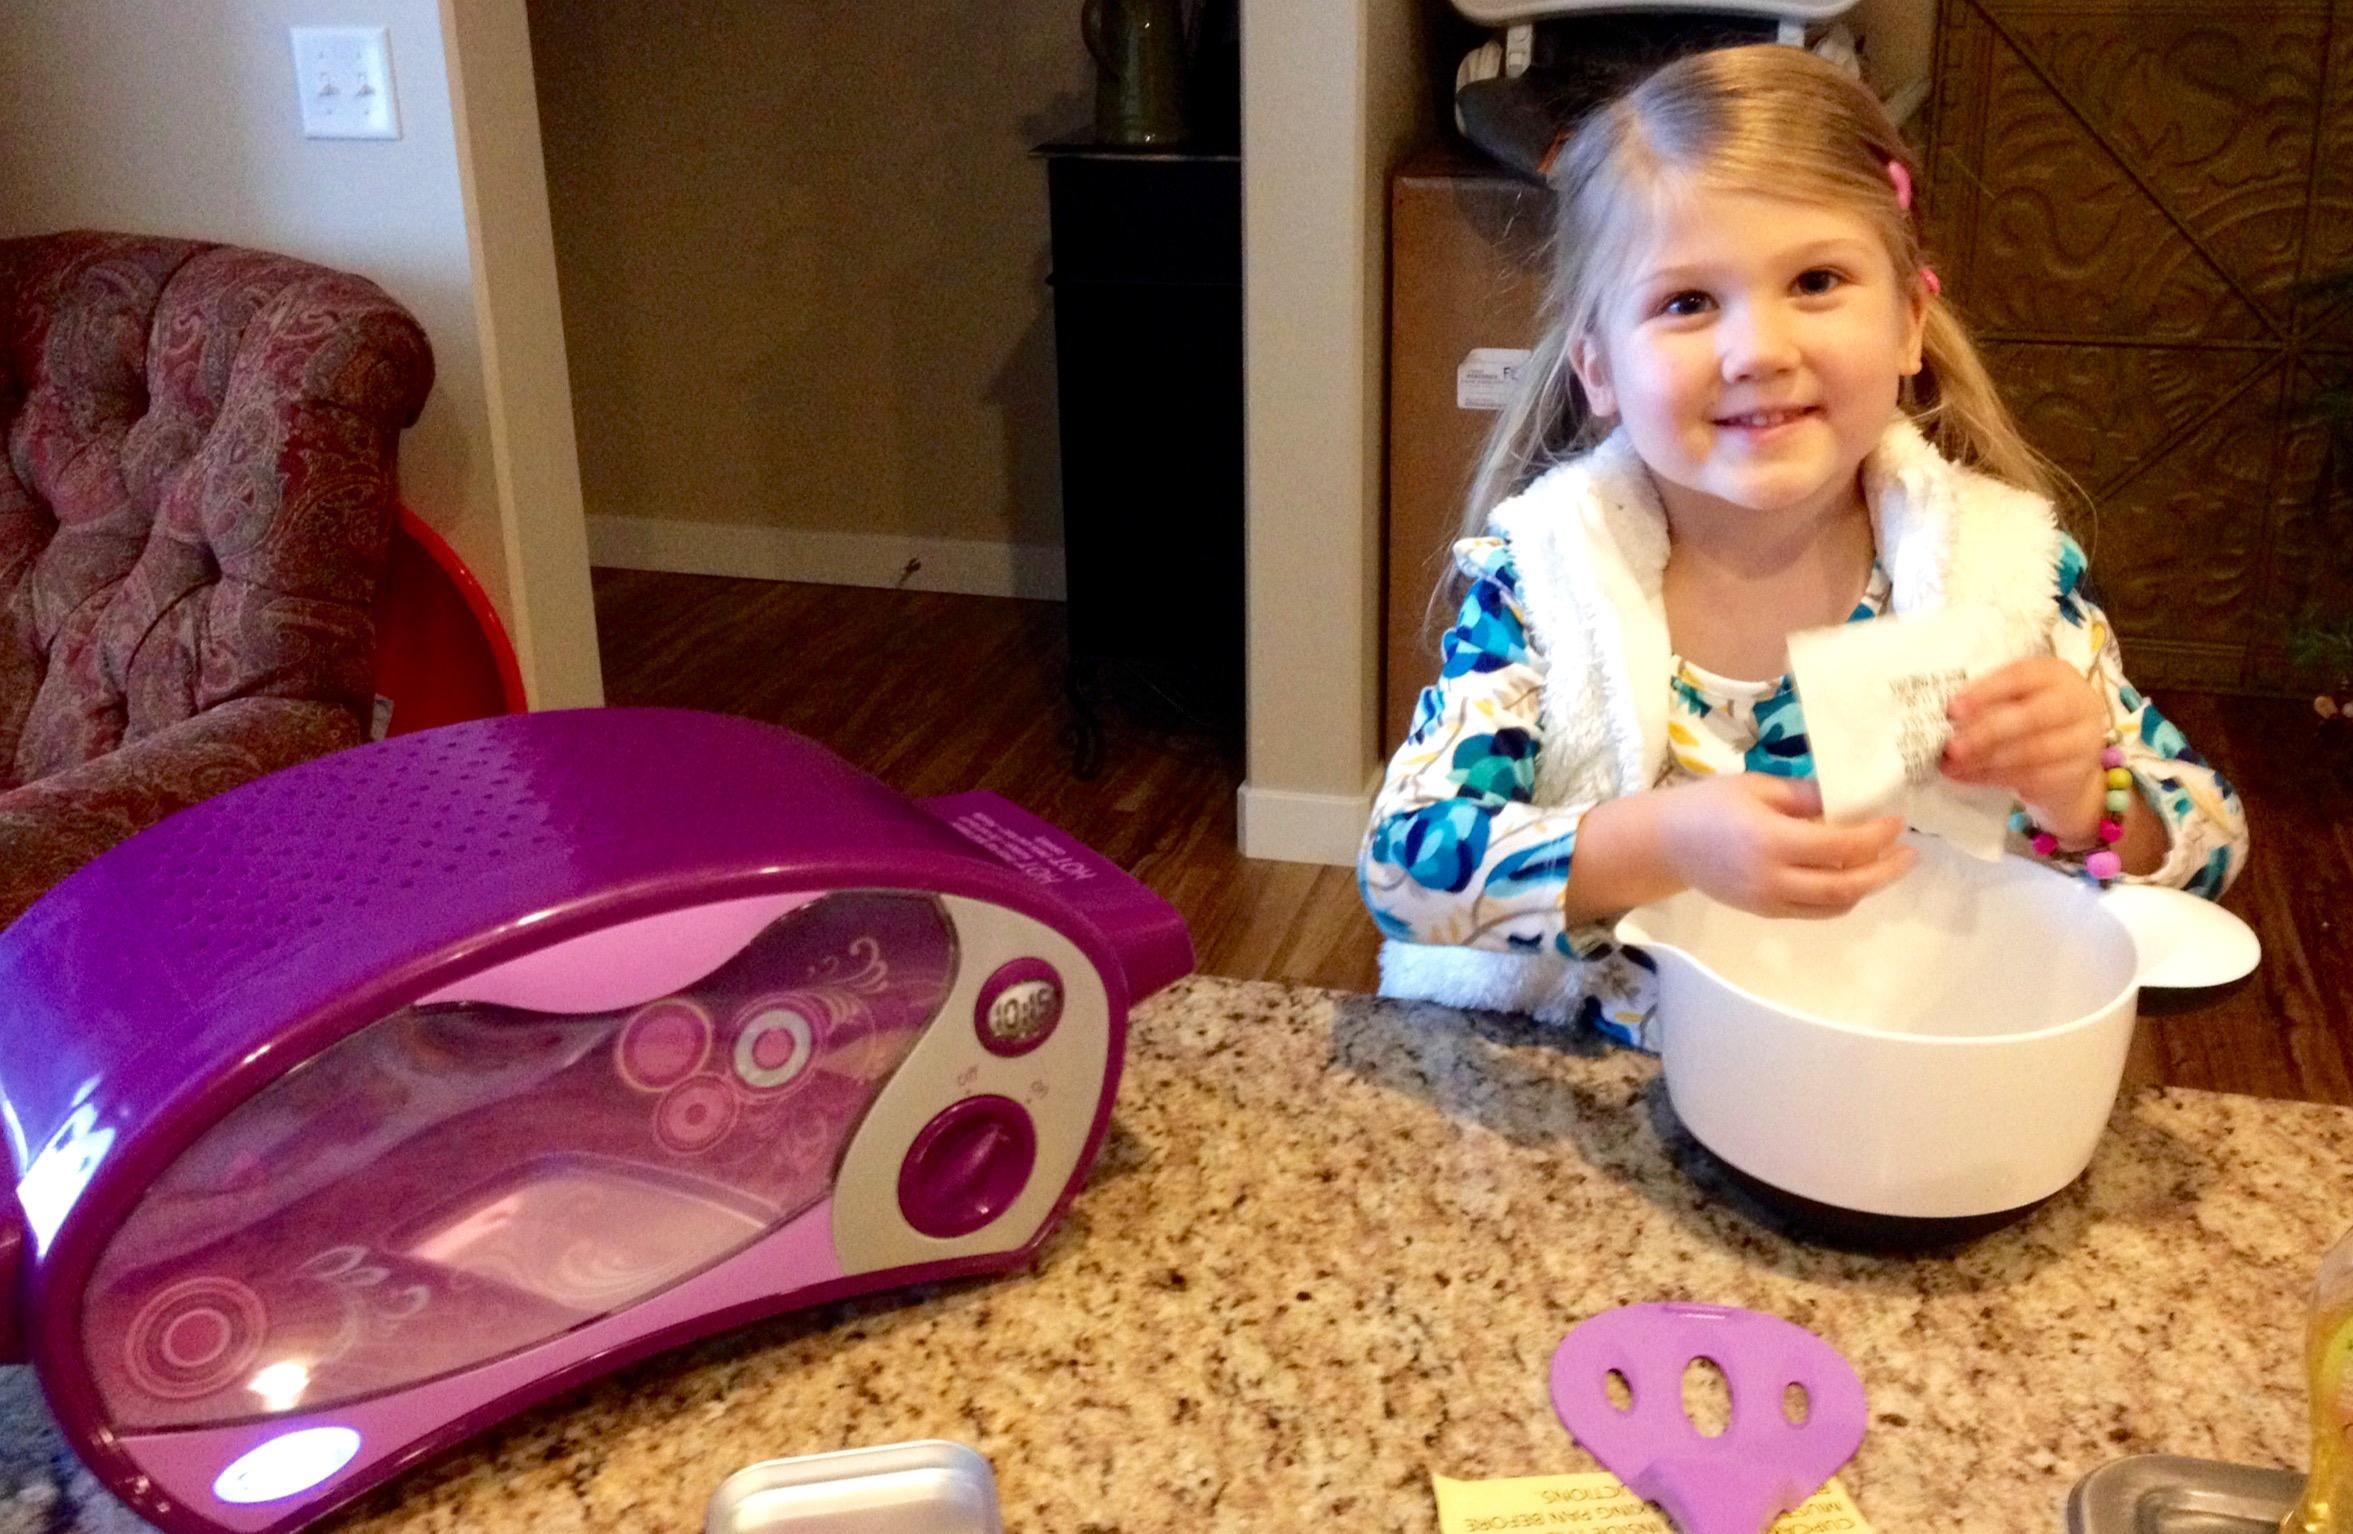 Grandma's Favorite Things...Easy Bake Oven